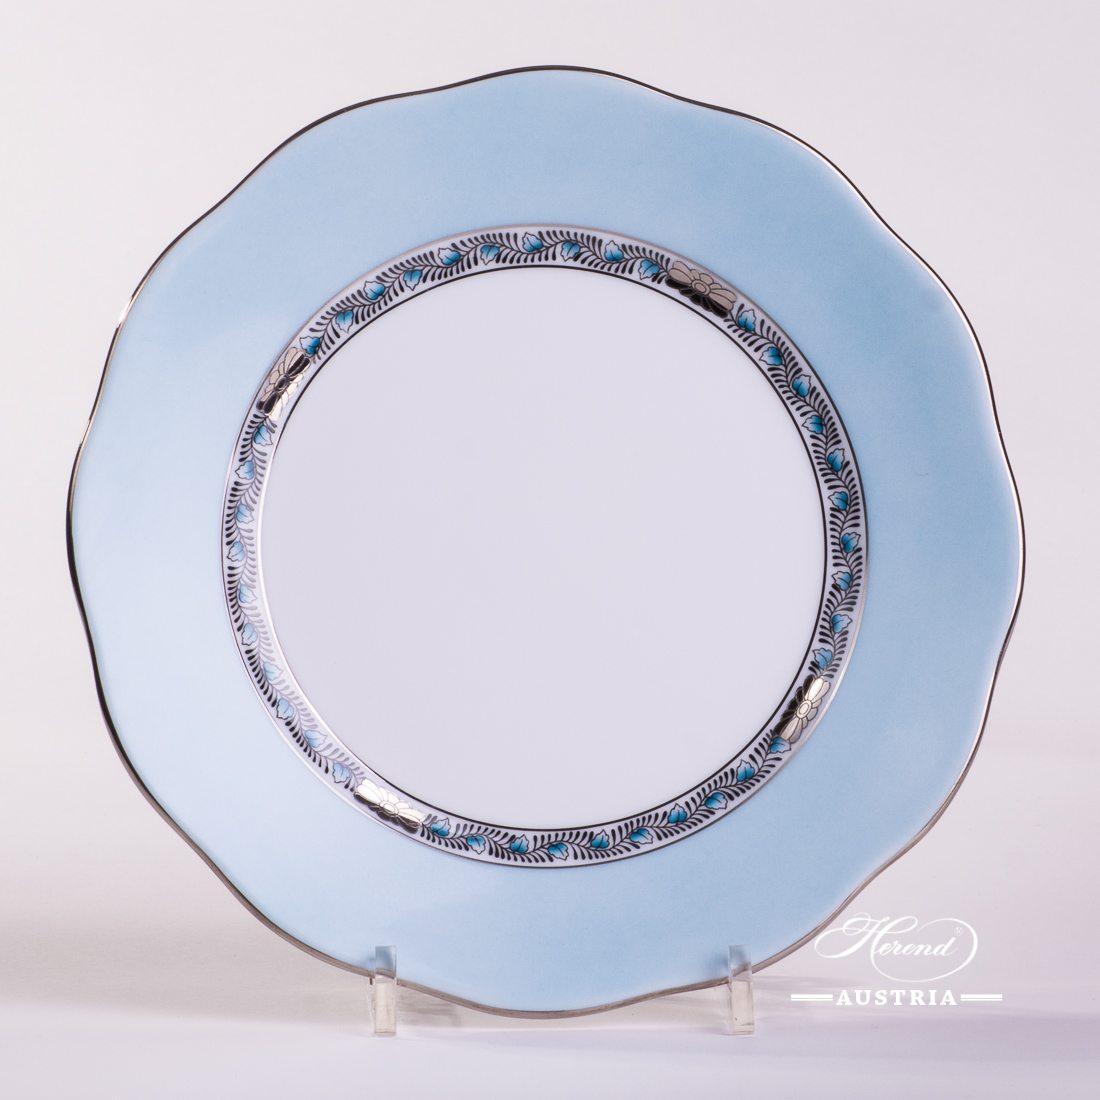 Apponyi Turquoise Dessert Plate - 20517-0-00 E-511 - Herend Porcelain